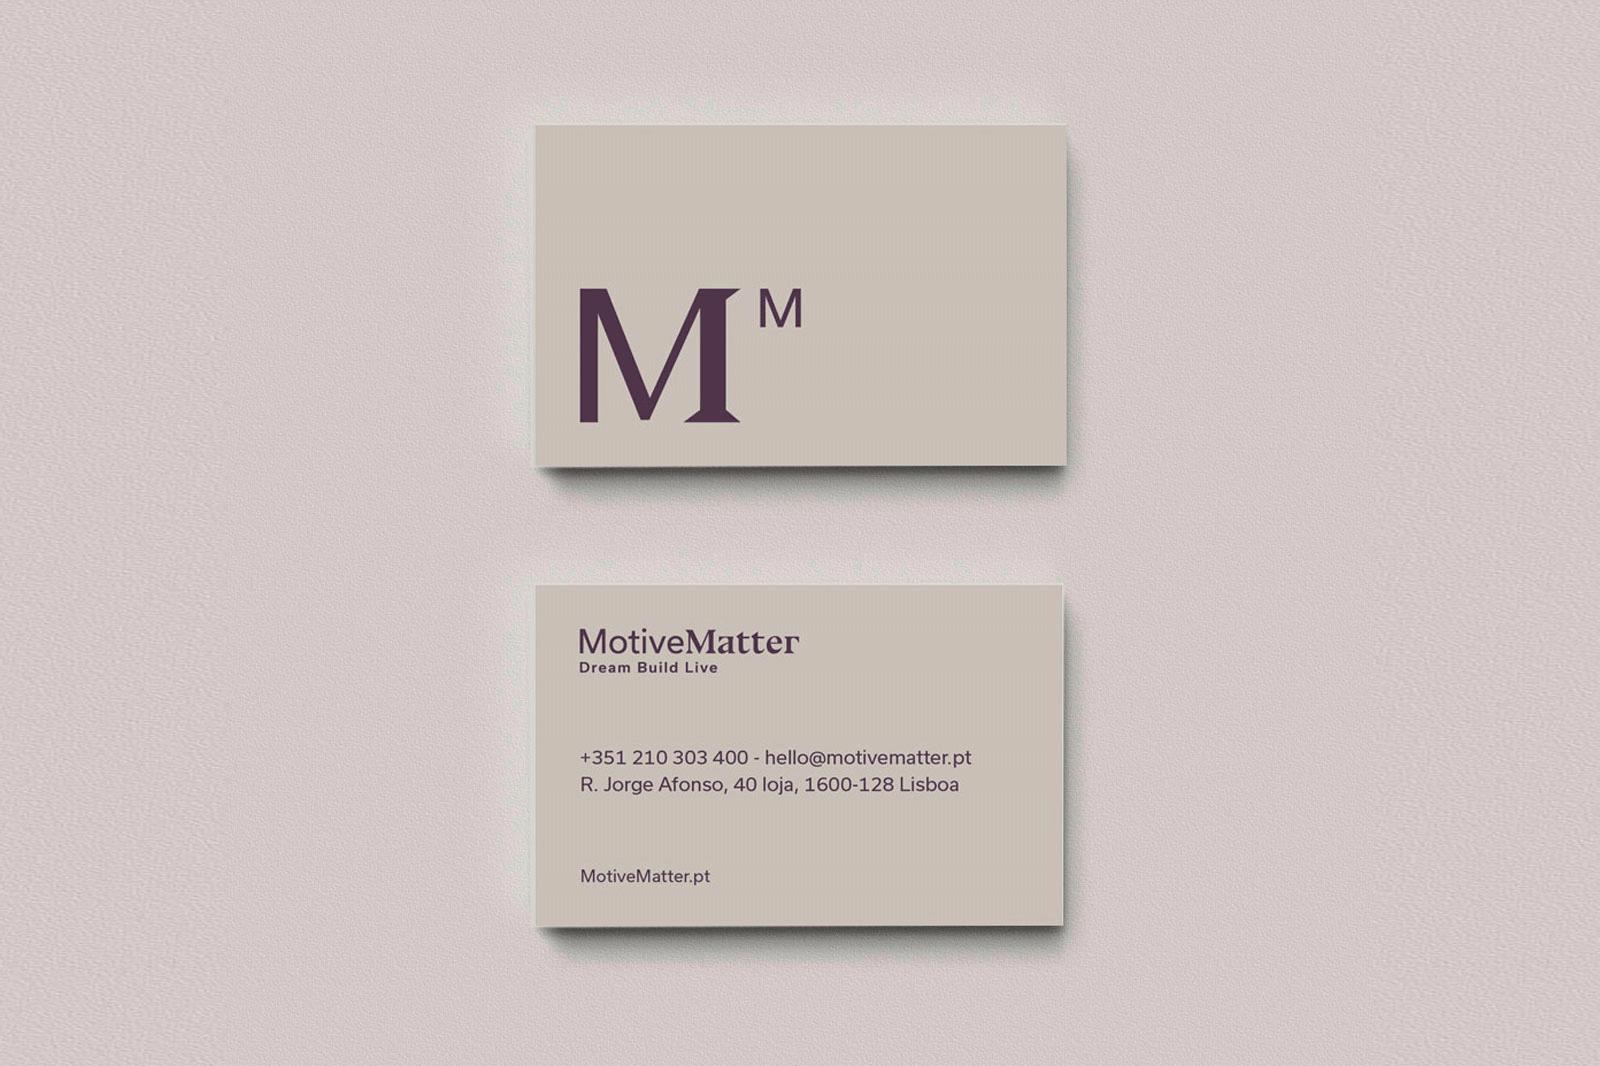 galeria5 motivematter activemedia